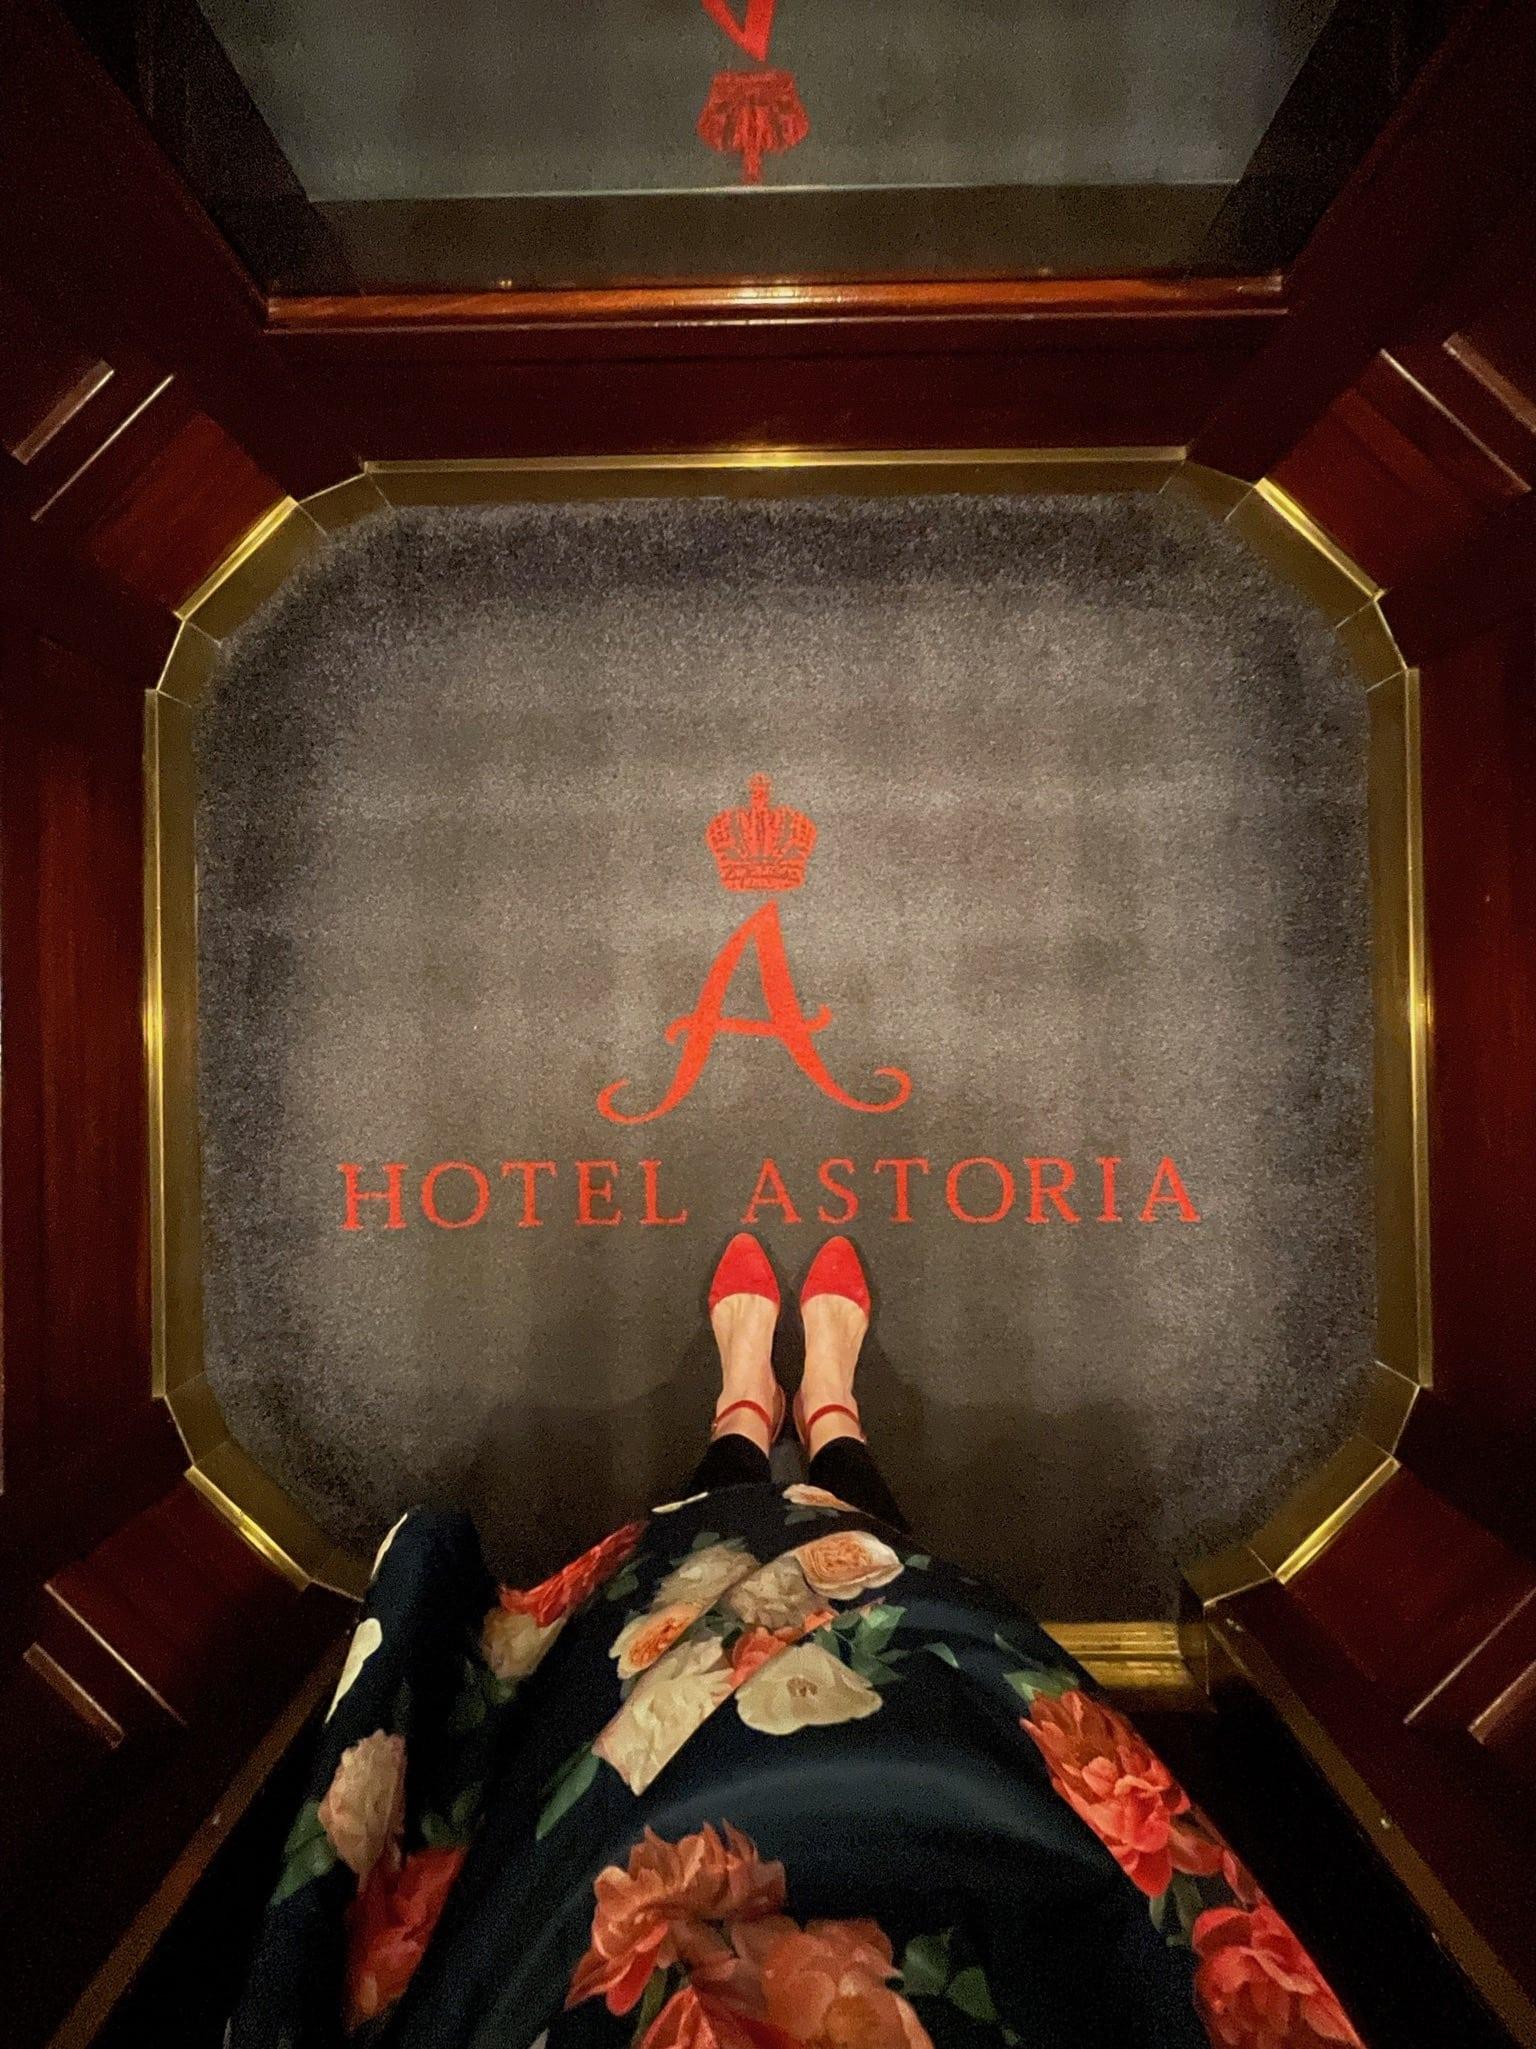 Rote Schuhe: Fotografiert im Hotel Astoria